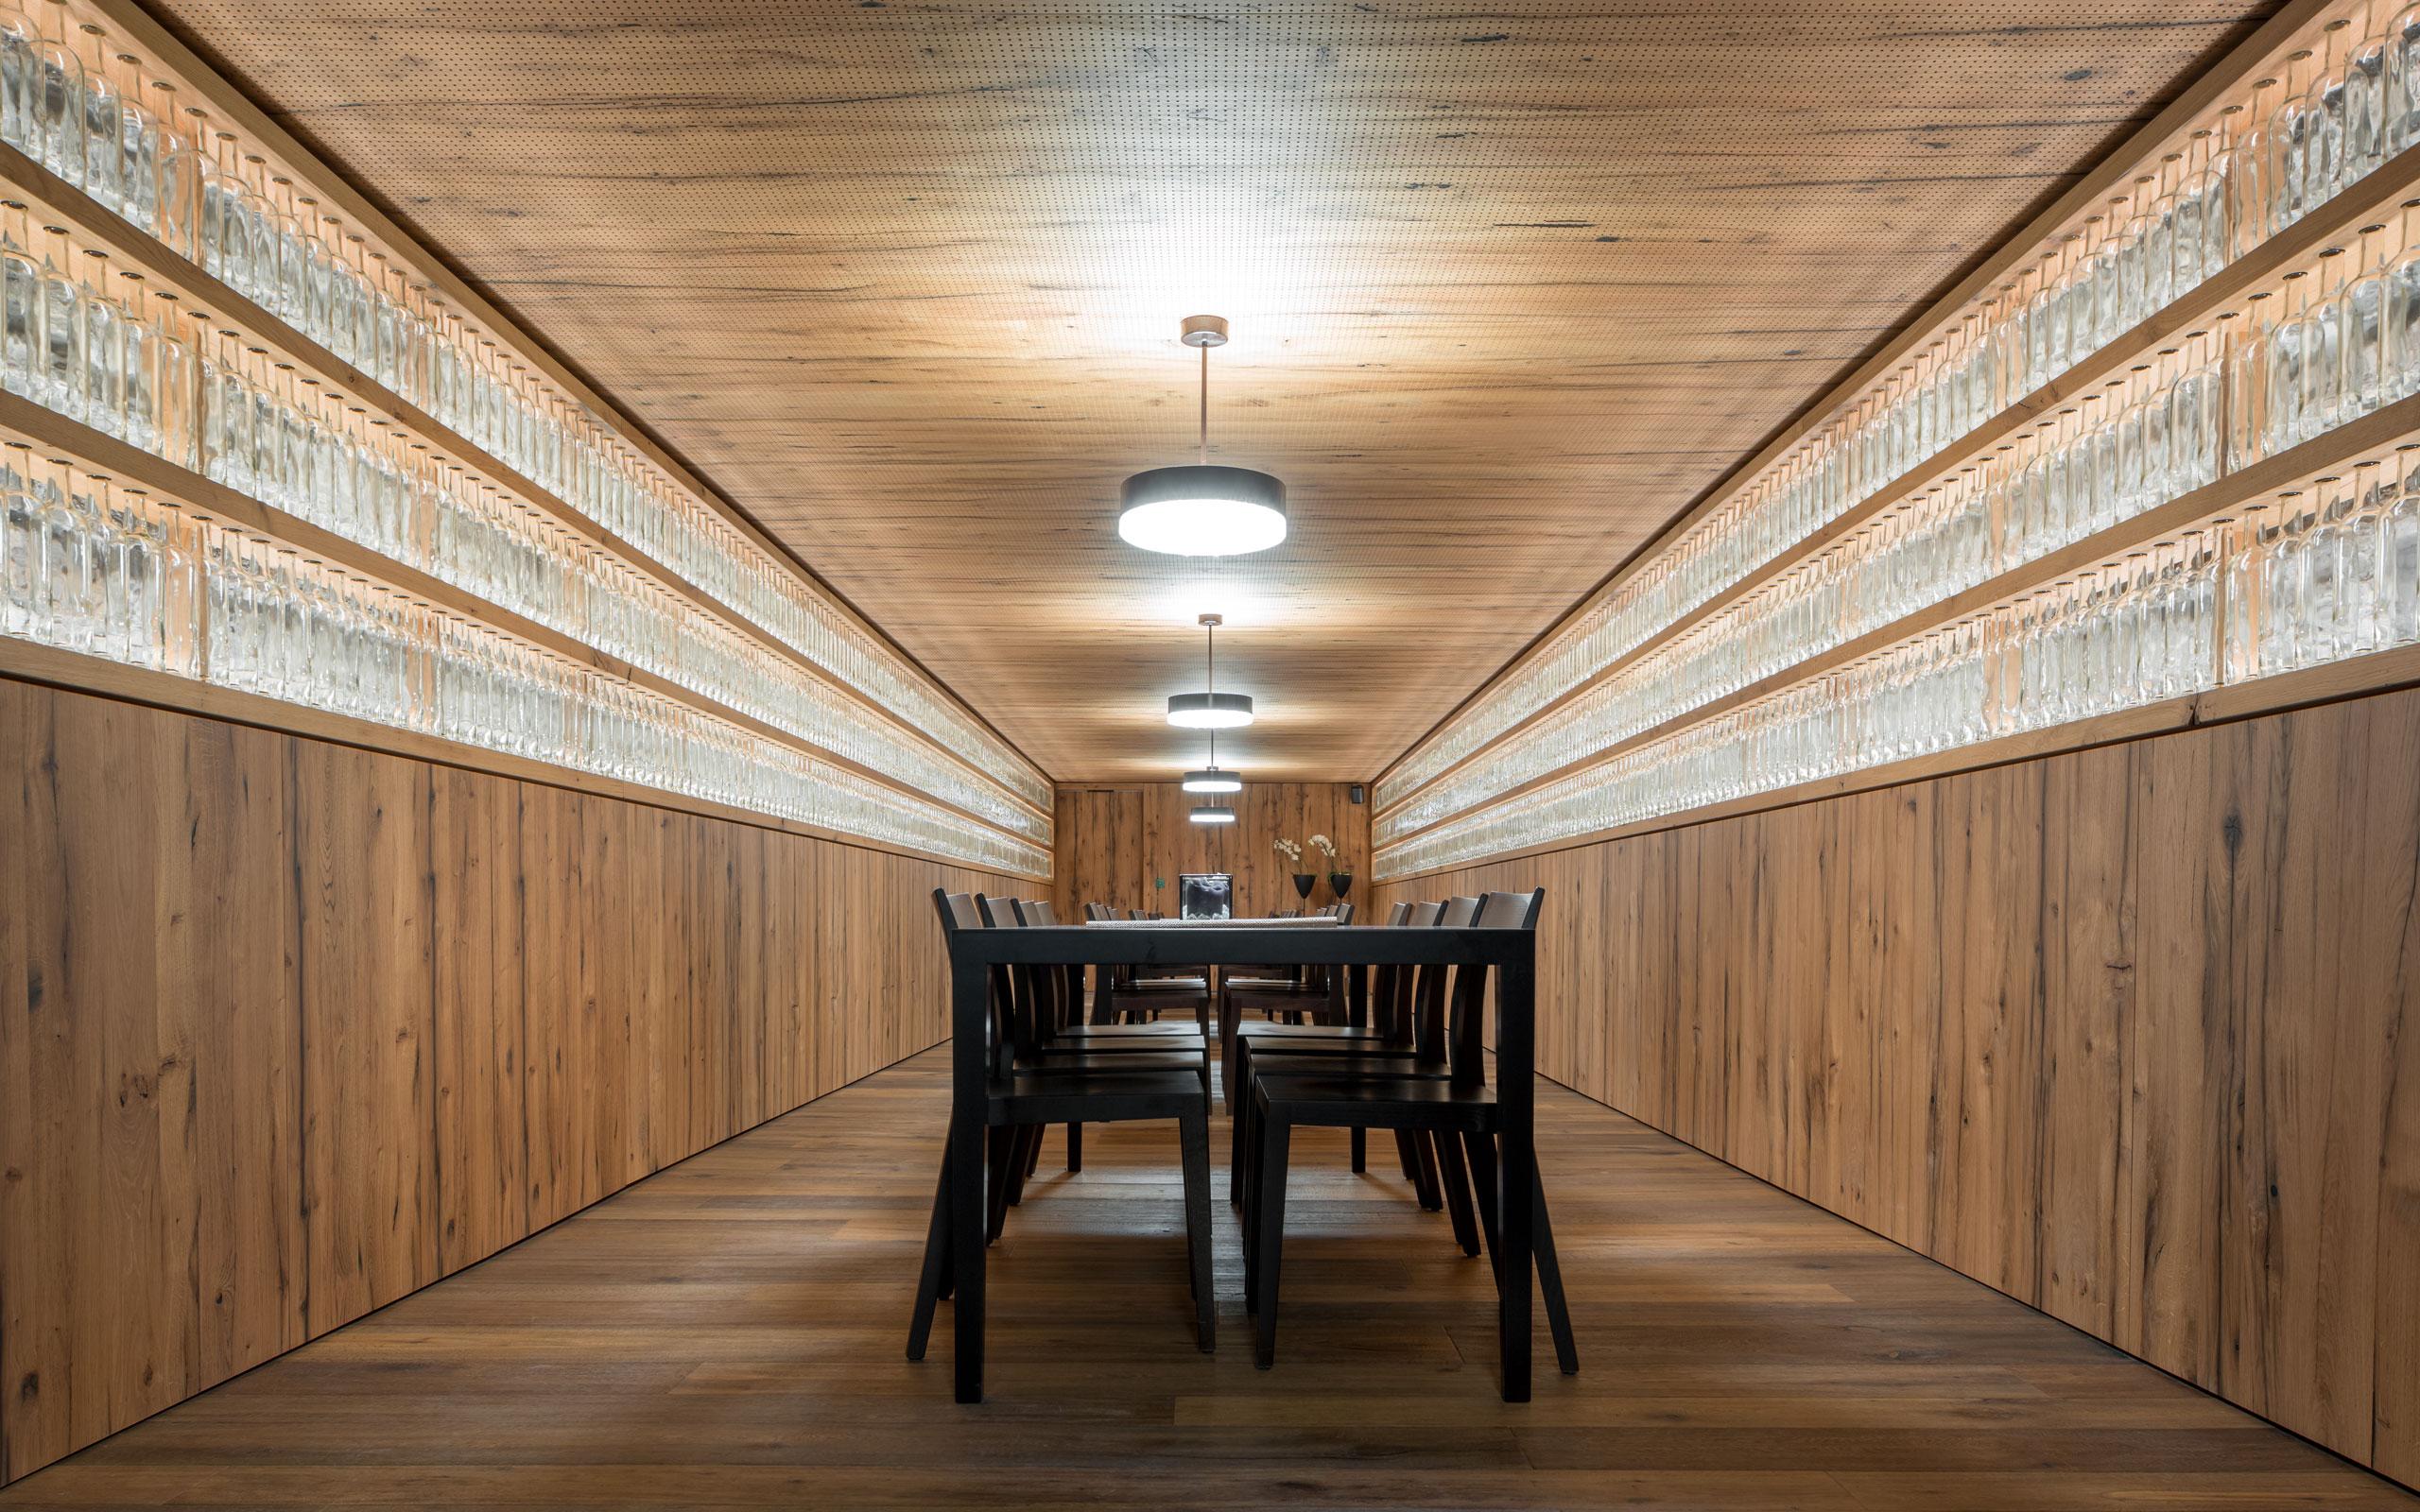 Architektur: Bauatelier12.ch, Jodernkellerei_Visperterminen